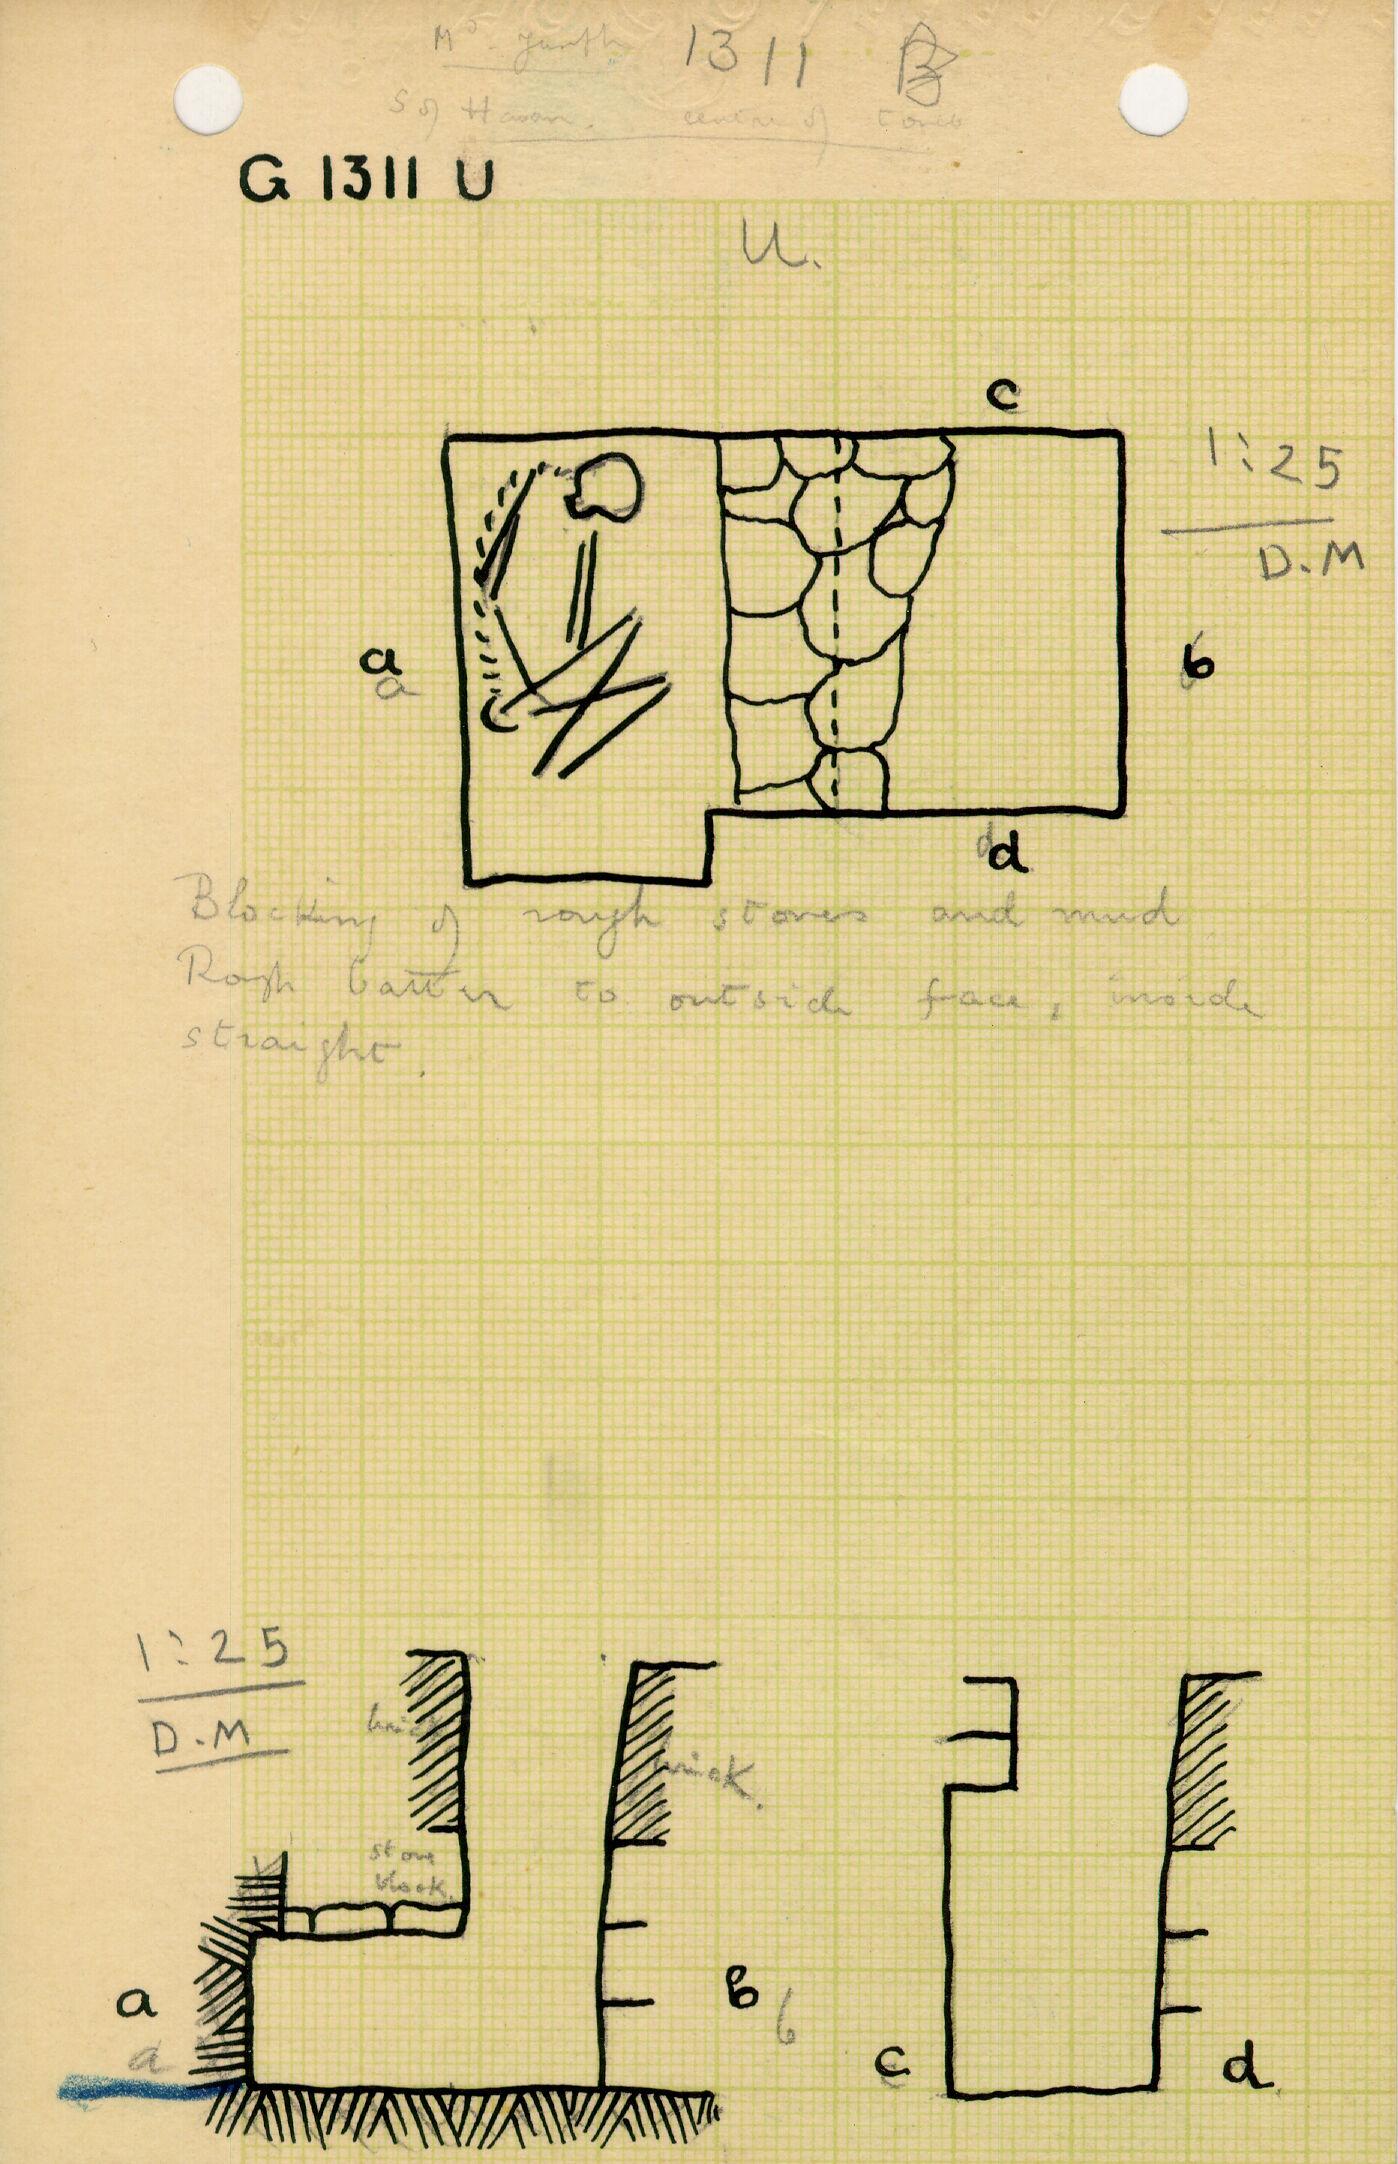 Maps and plans: G 1311, Shaft U